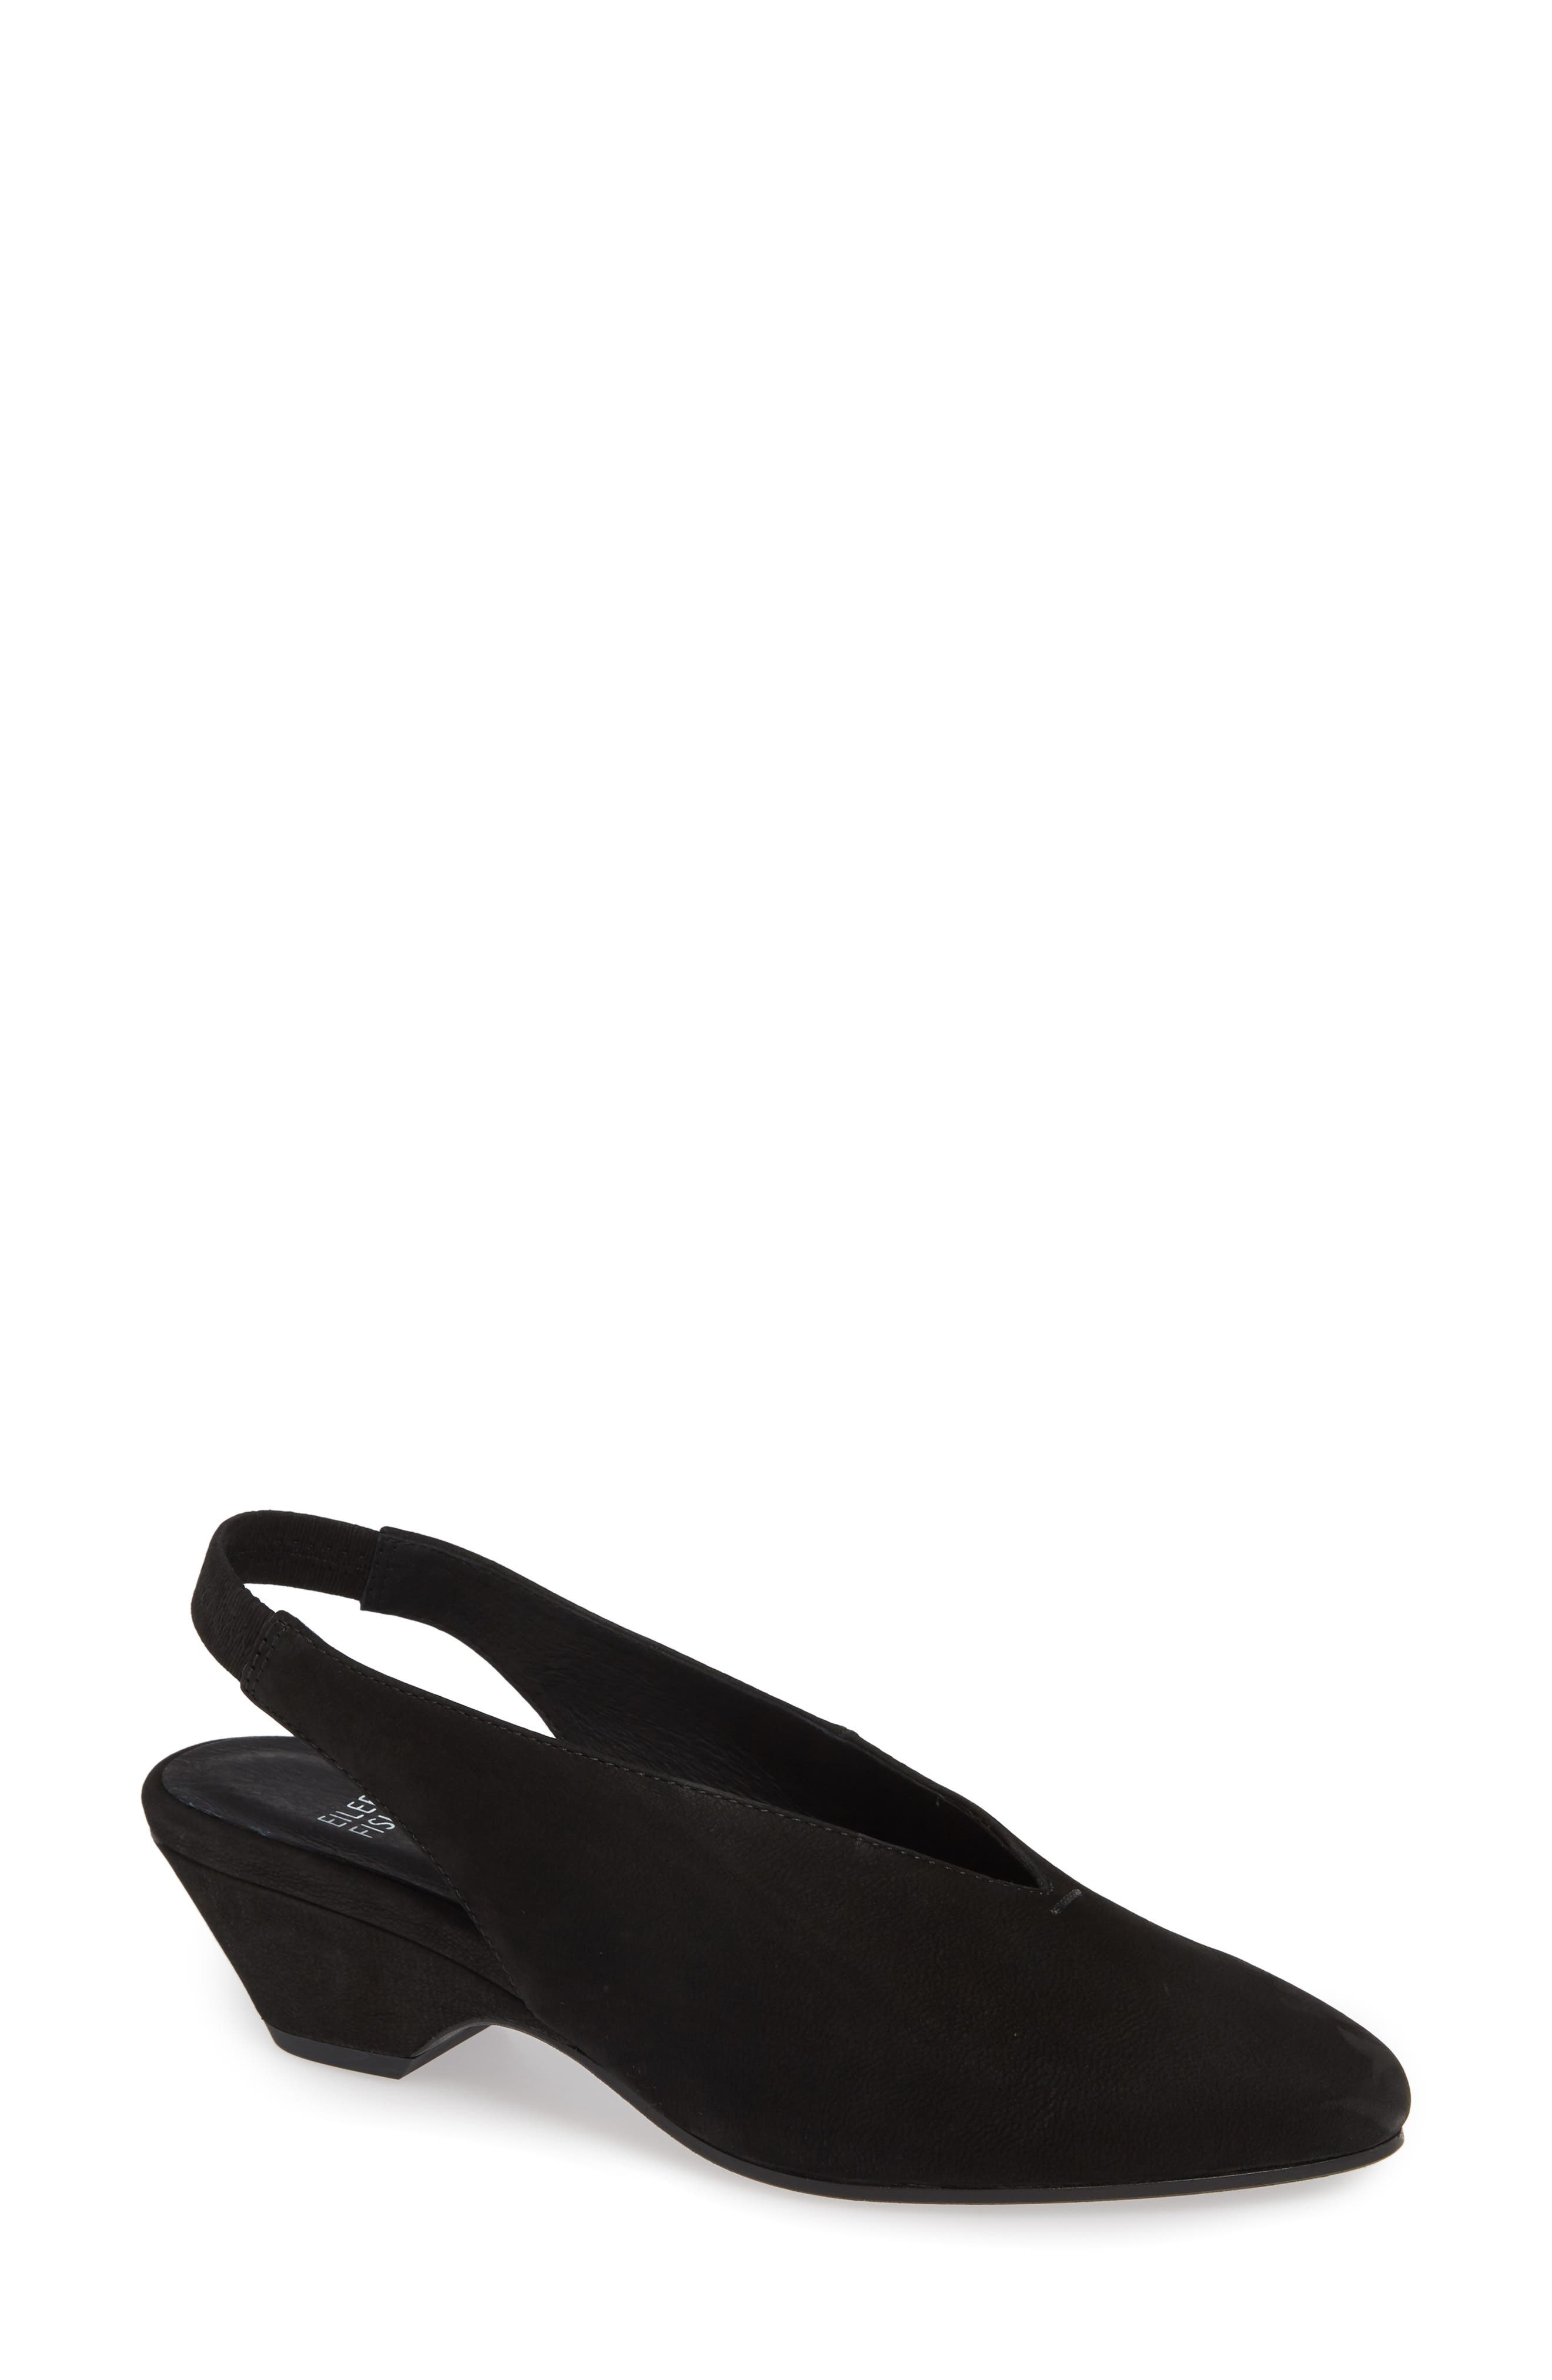 Eileen Fisher Gatwick Slingback Pump, Black